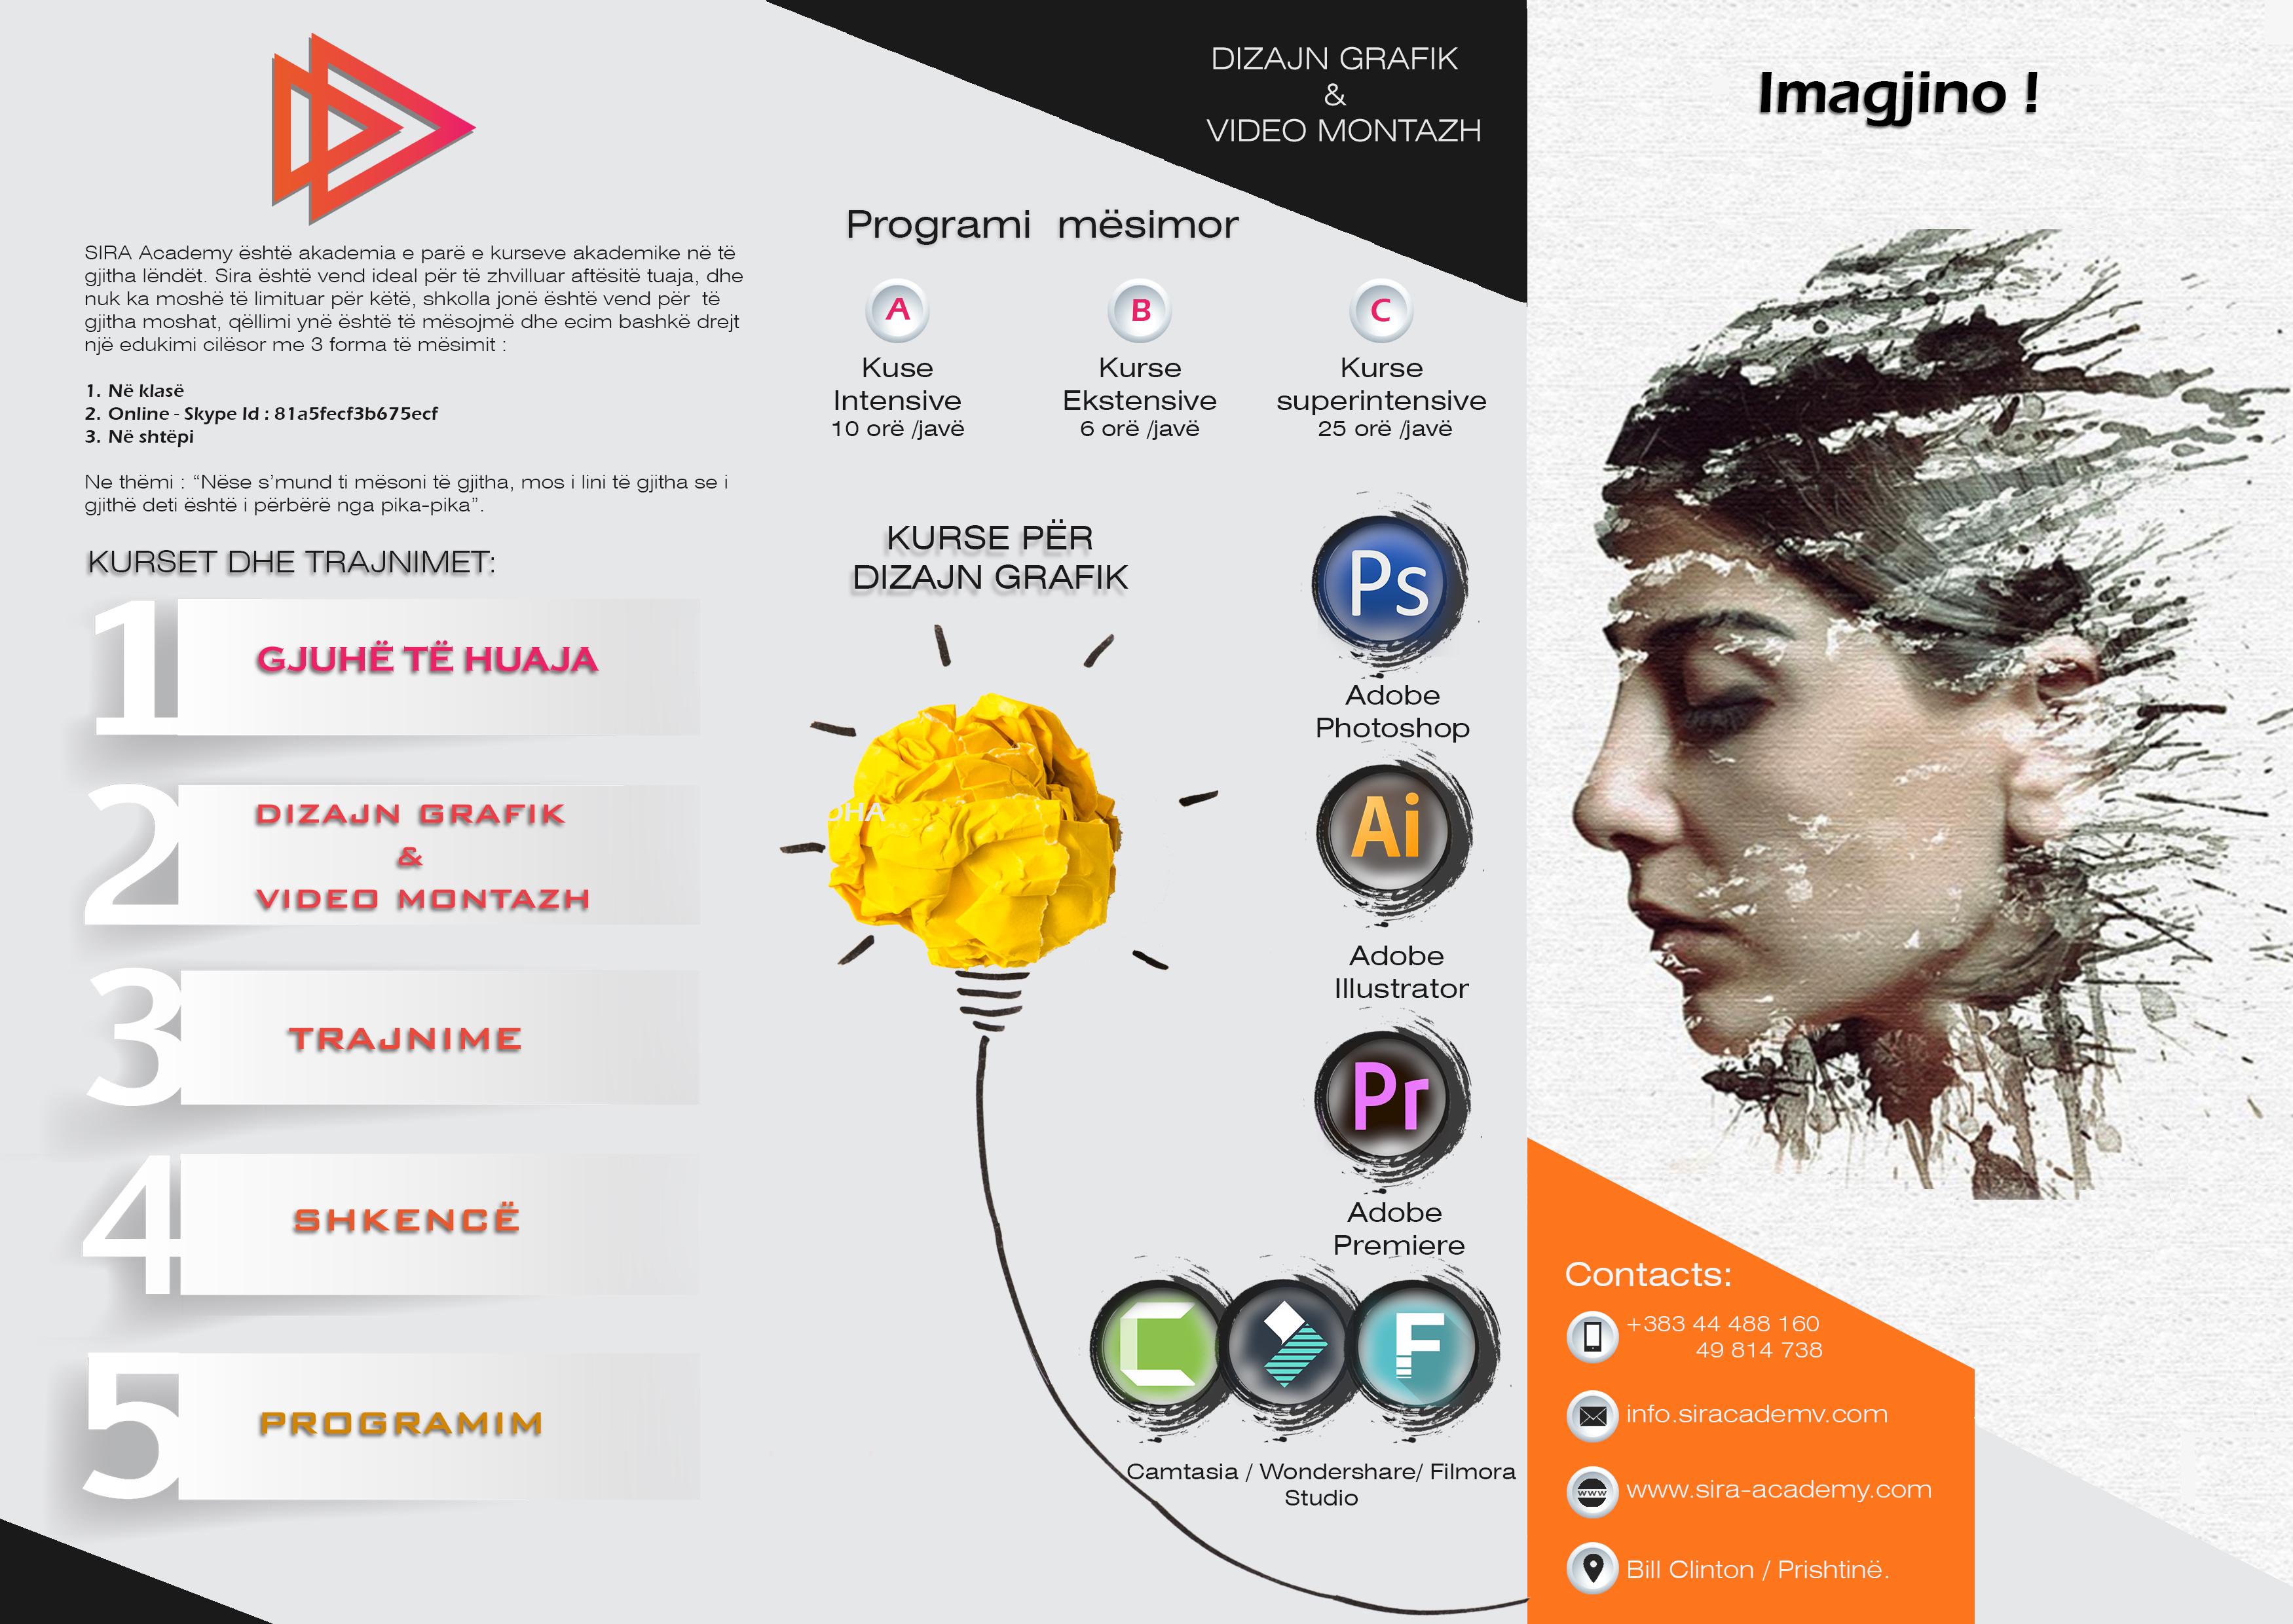 Dizajn Grafik Photoshop & Ilustrator